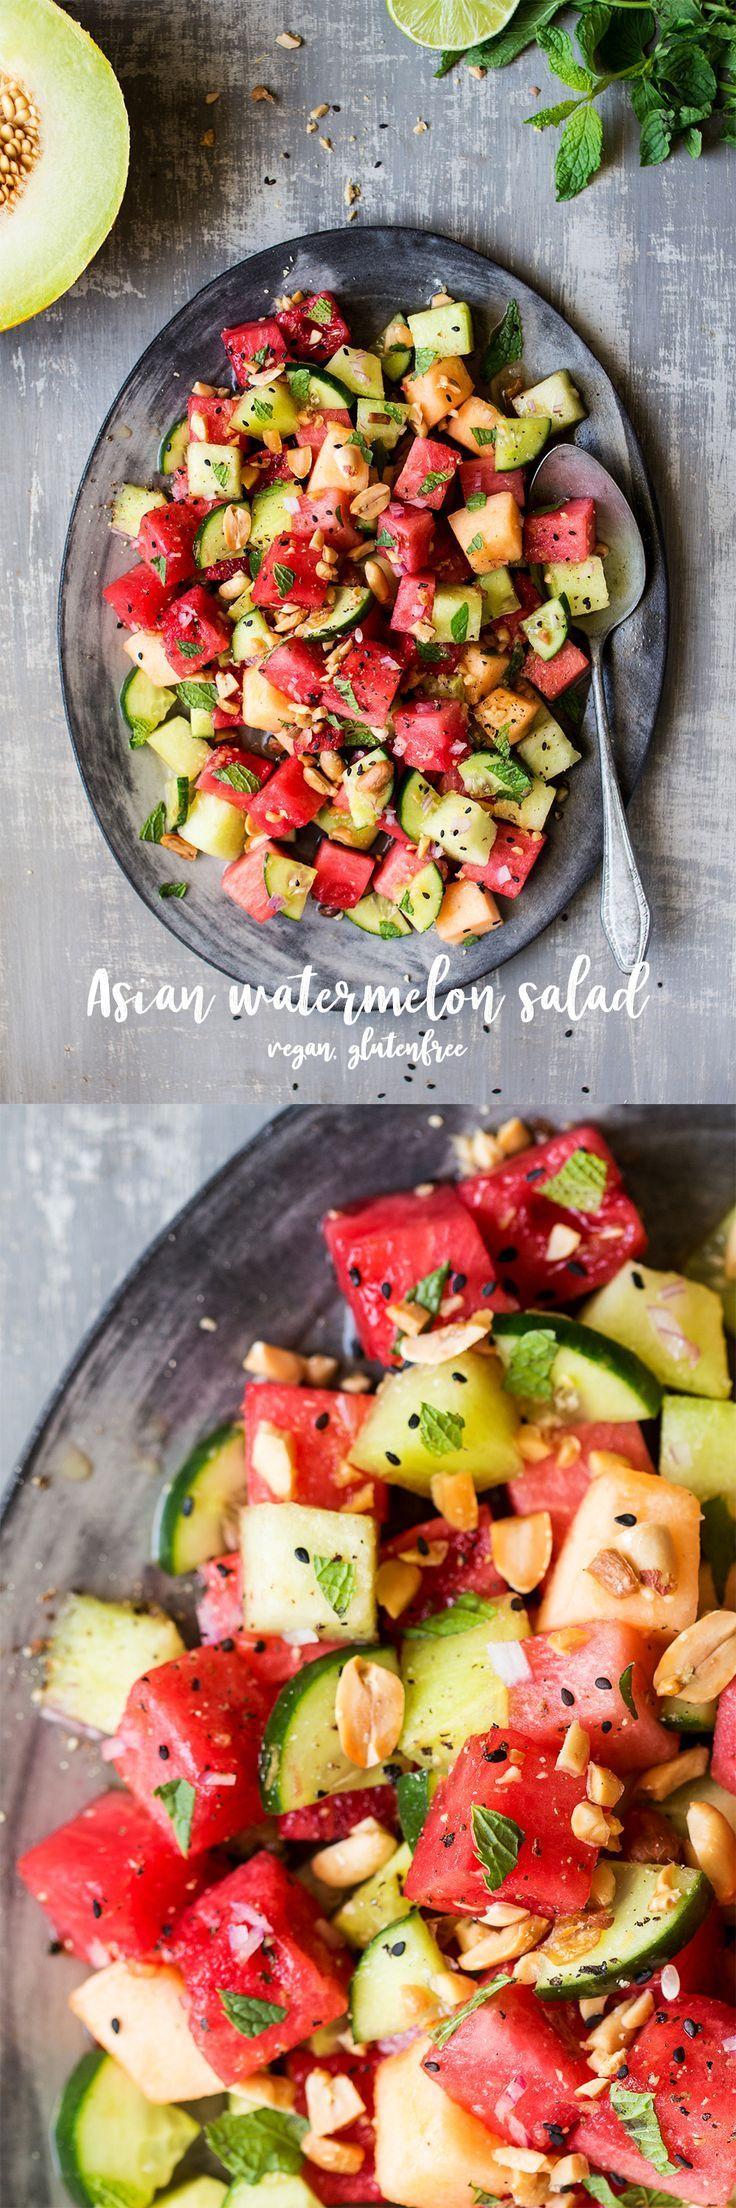 Asian watermelon salad